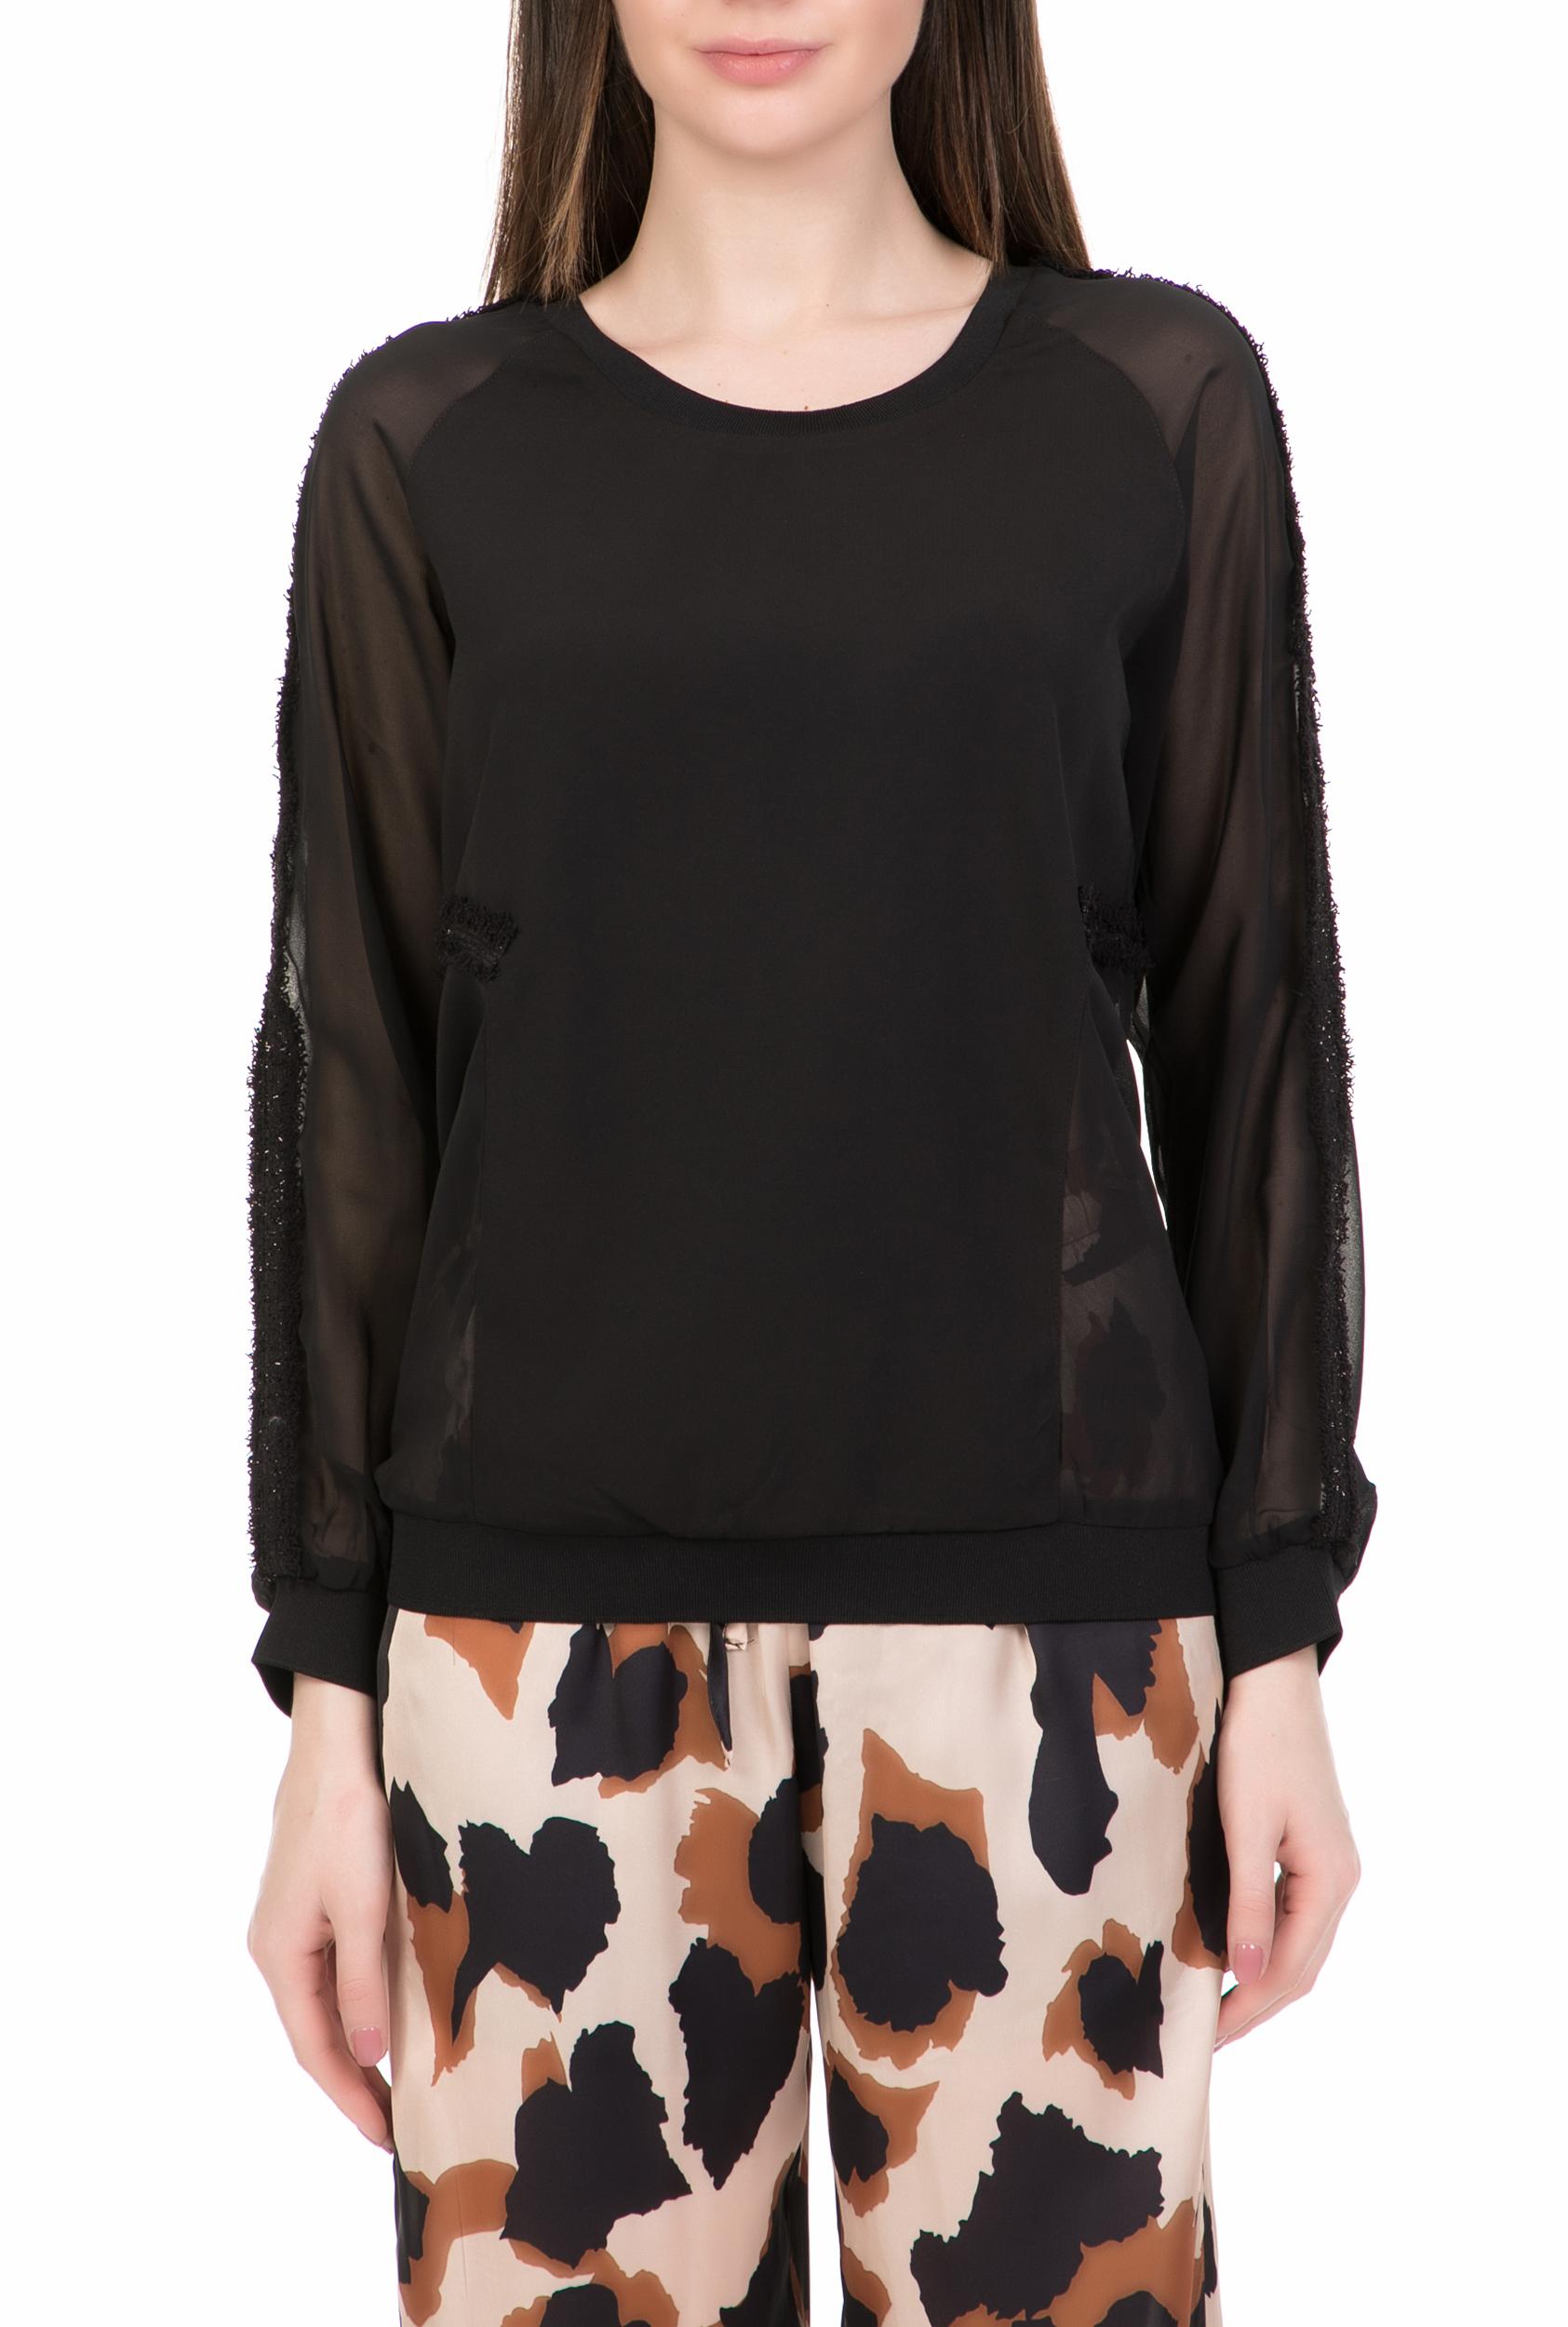 54e3794591a8 CollectiveOnline NU - Γυναικεία μακρυμάνικη μπλούζα NU μαύρη